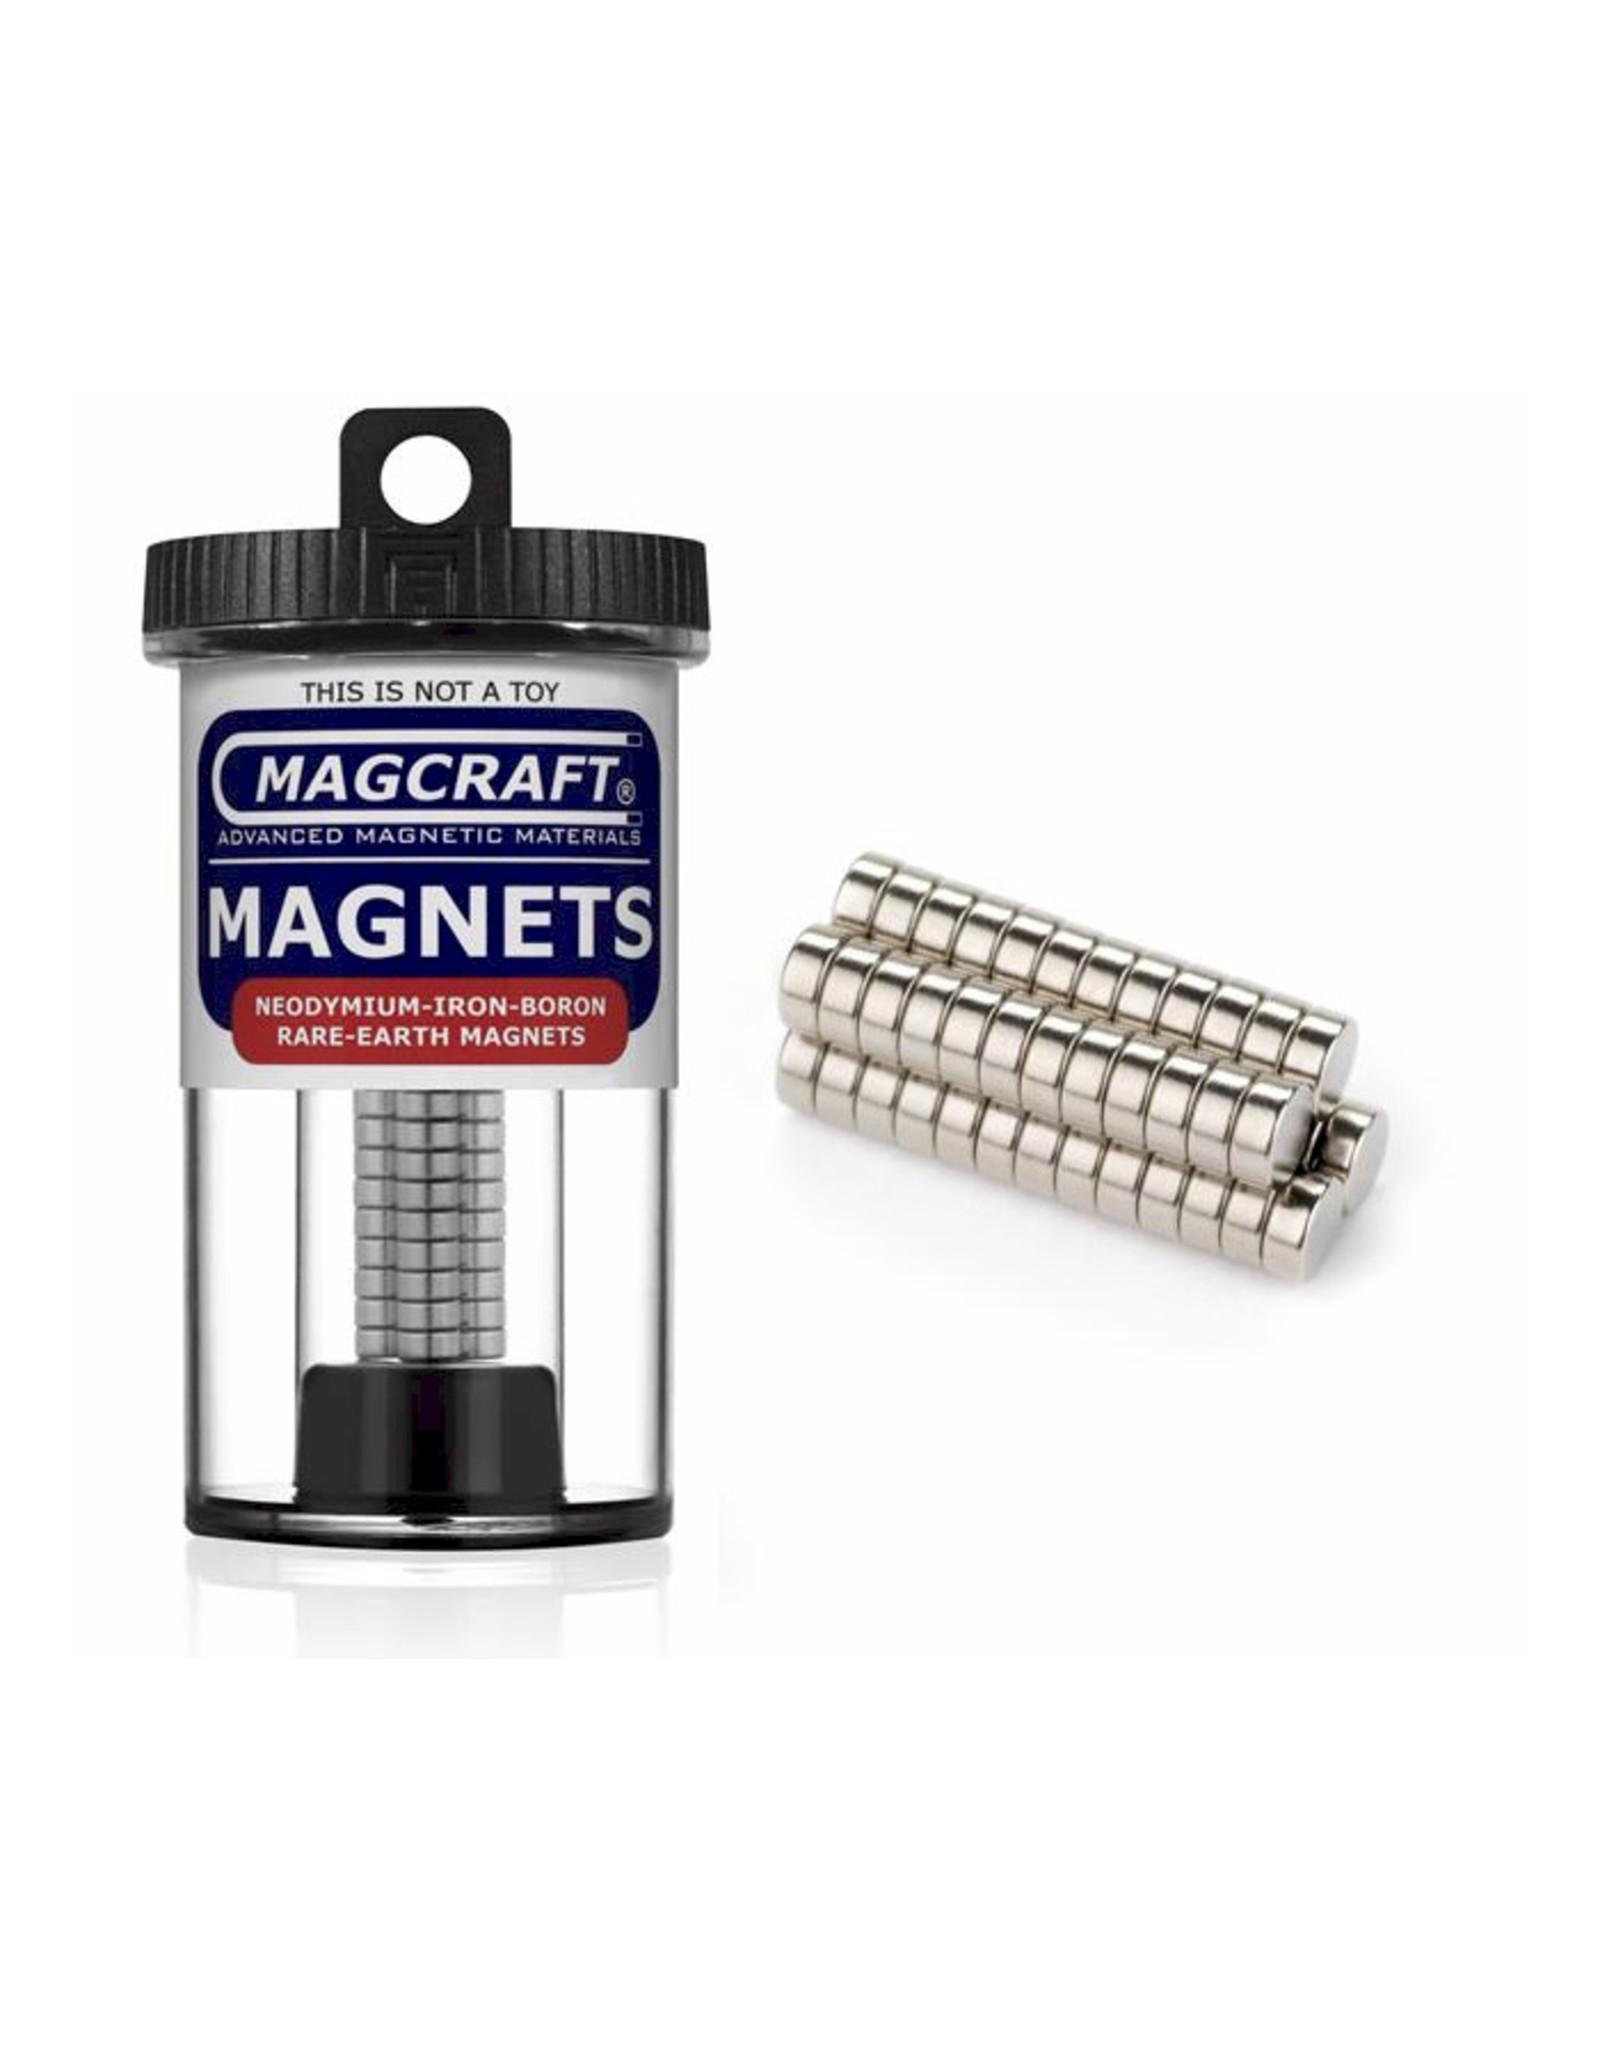 "Magcraft NSN0601 - Disc 0.25'' x 0.1"" (50 Count)"